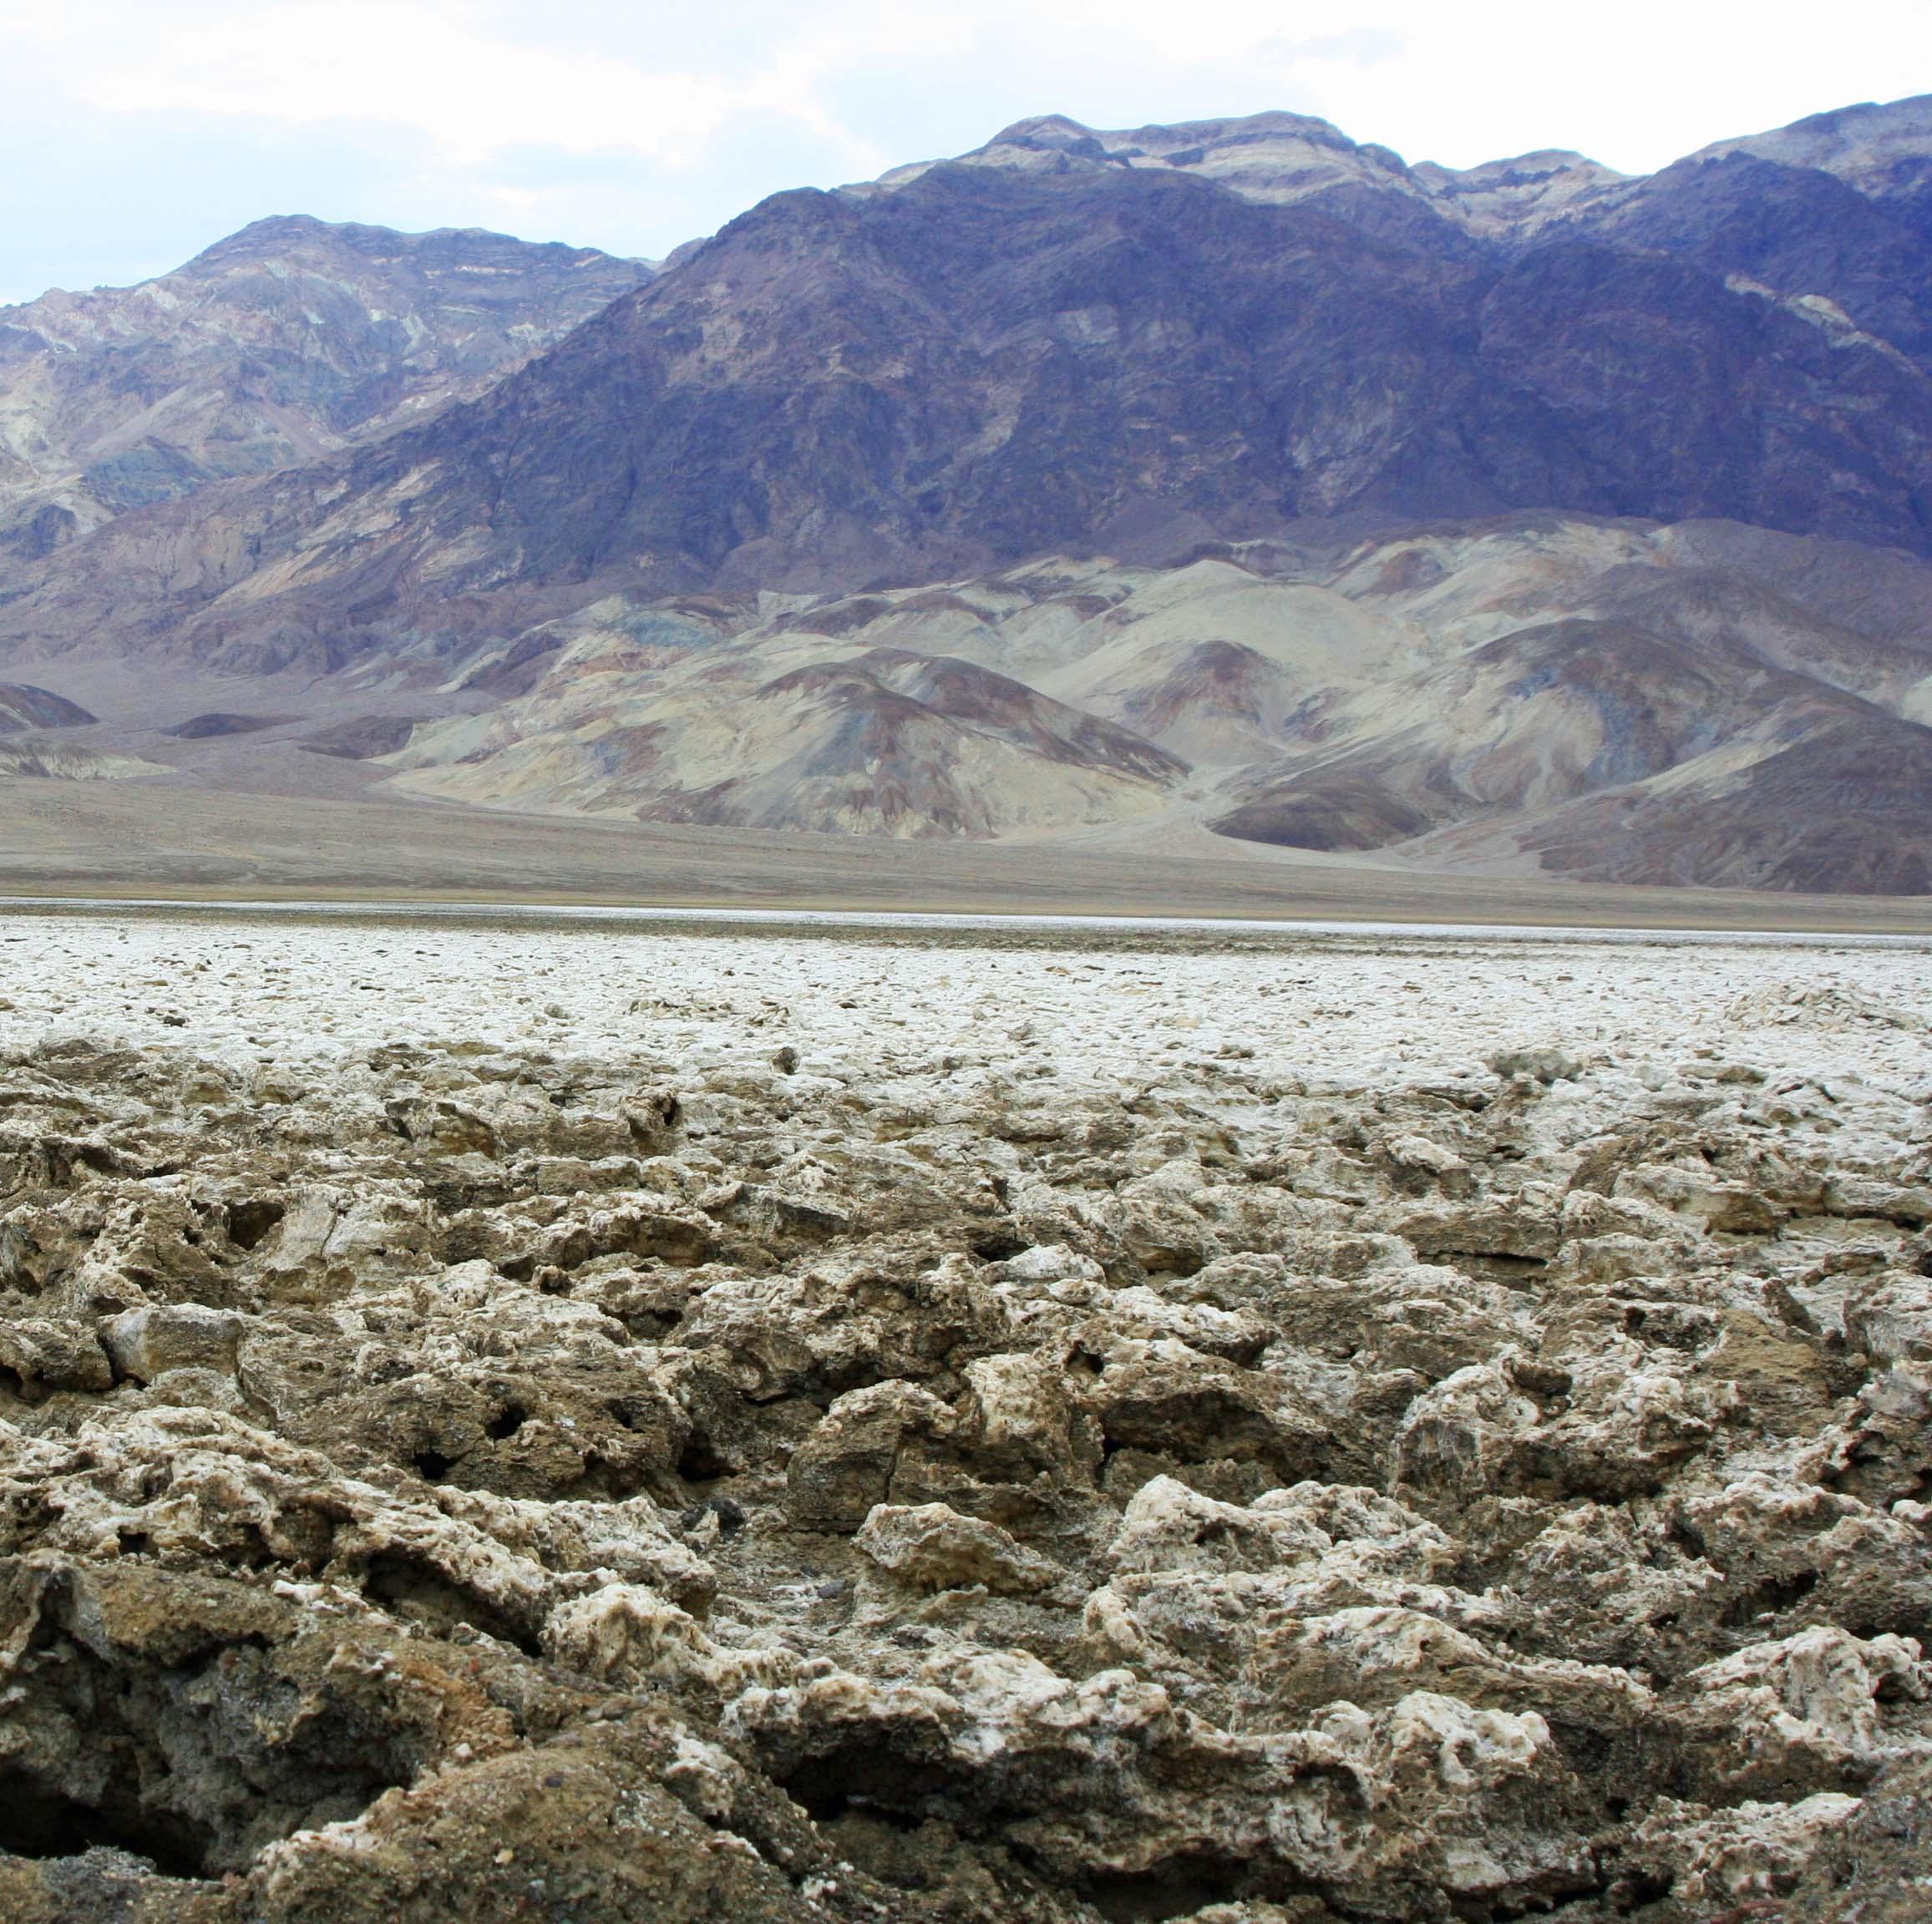 Devil's Golf Course, Death Valley. Photo by Curtis Mekemson.